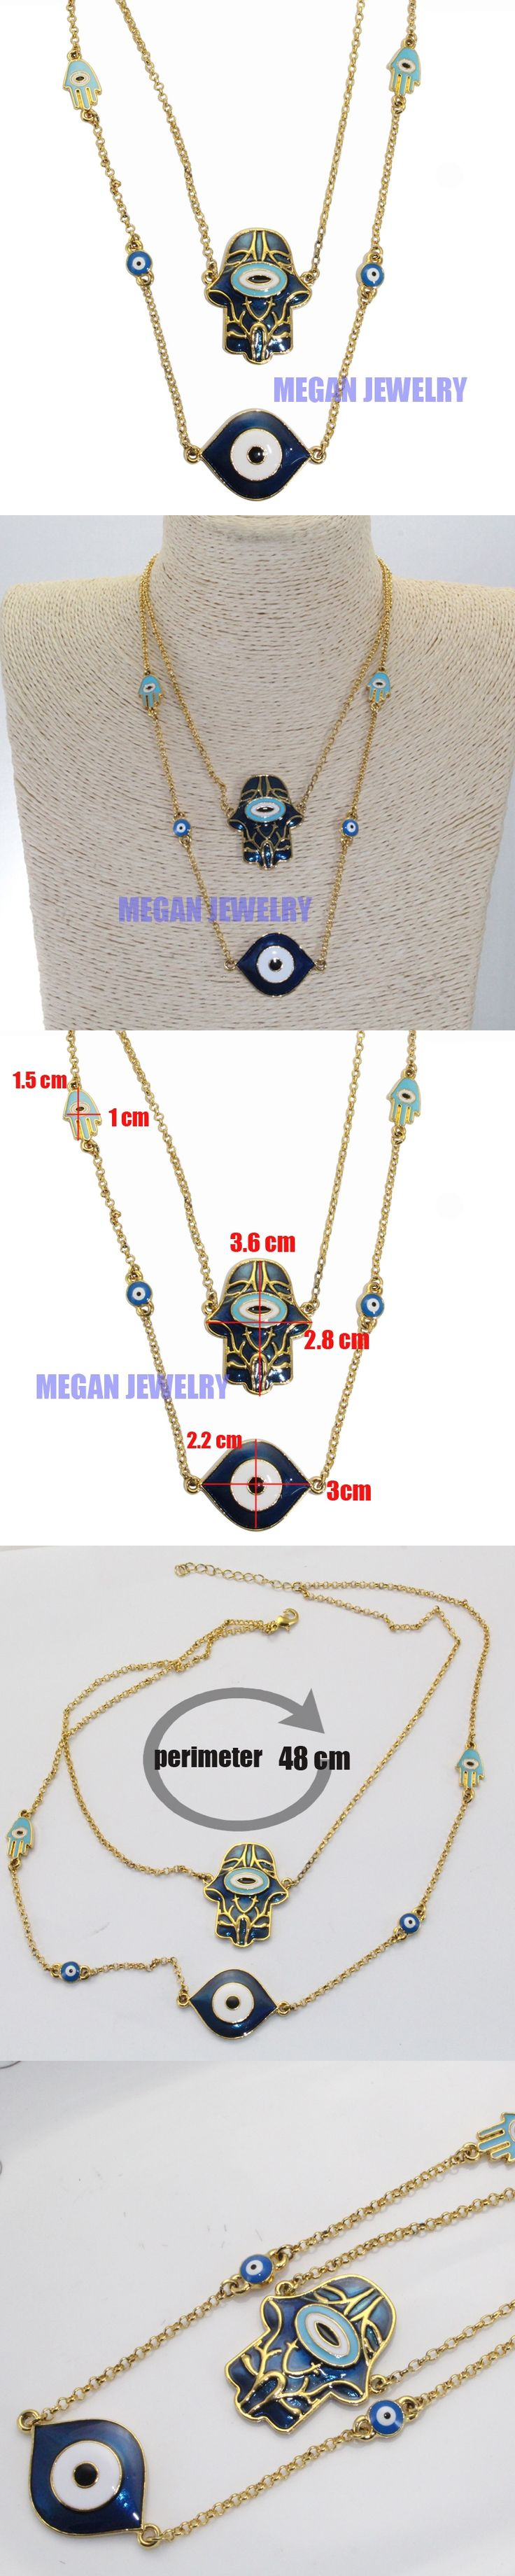 muslim turkish evil eye Hamsa Hand Of Fatima necklace, islam jewelry fashion 51cm necklace